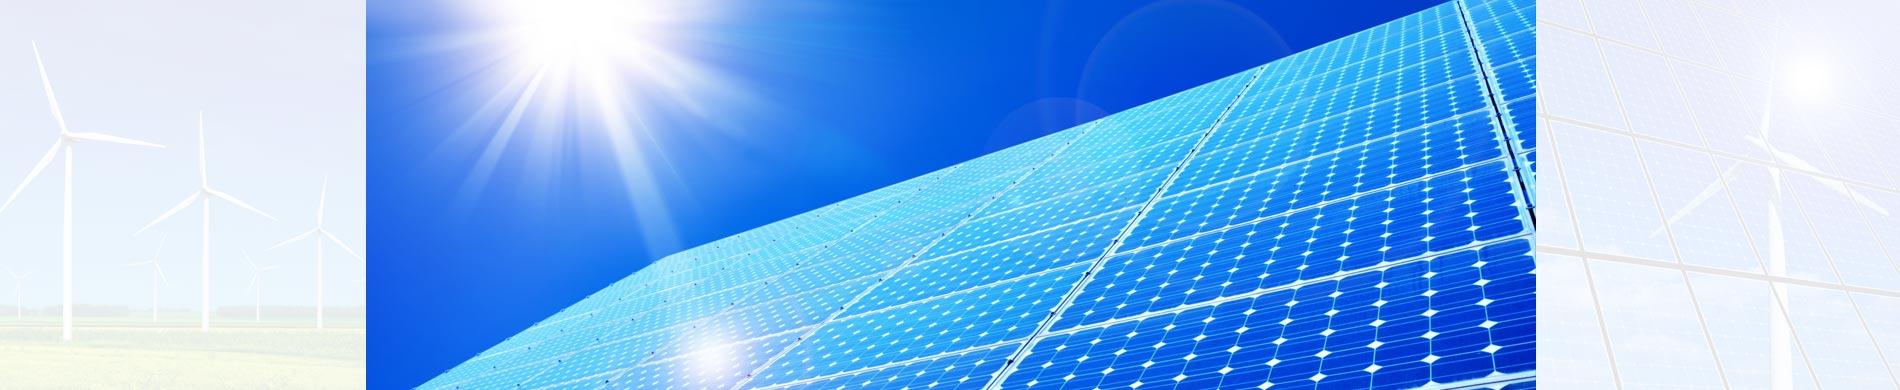 CEI NI Ltd - Solar Power